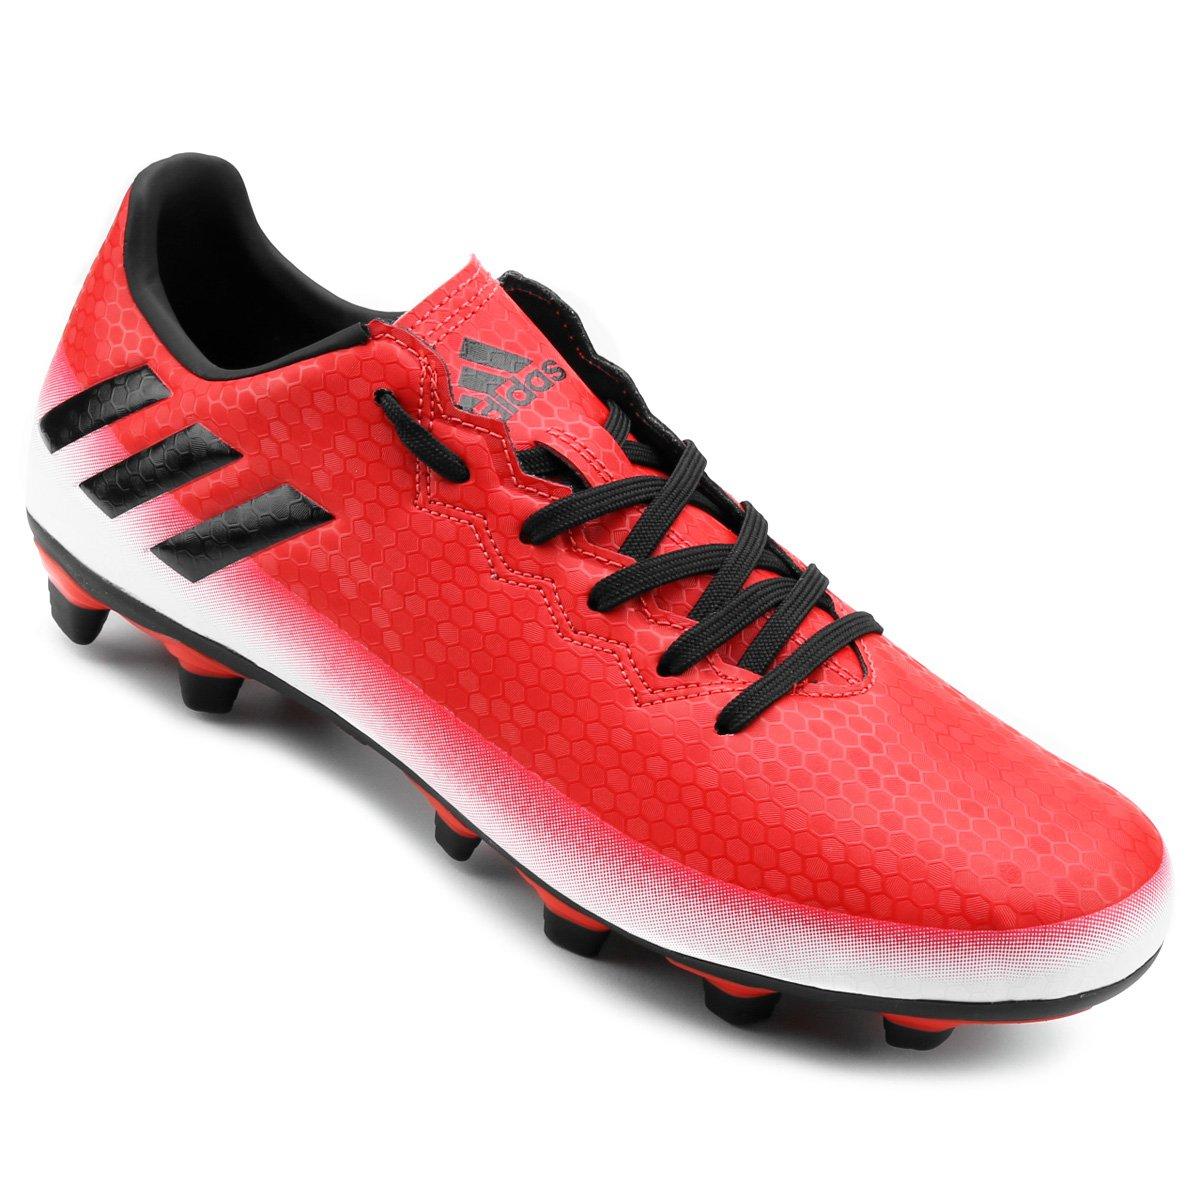 63d20b16d5b2f Chuteira Campo Adidas Messi 16.4 FXG Masculina - Compre Agora ...